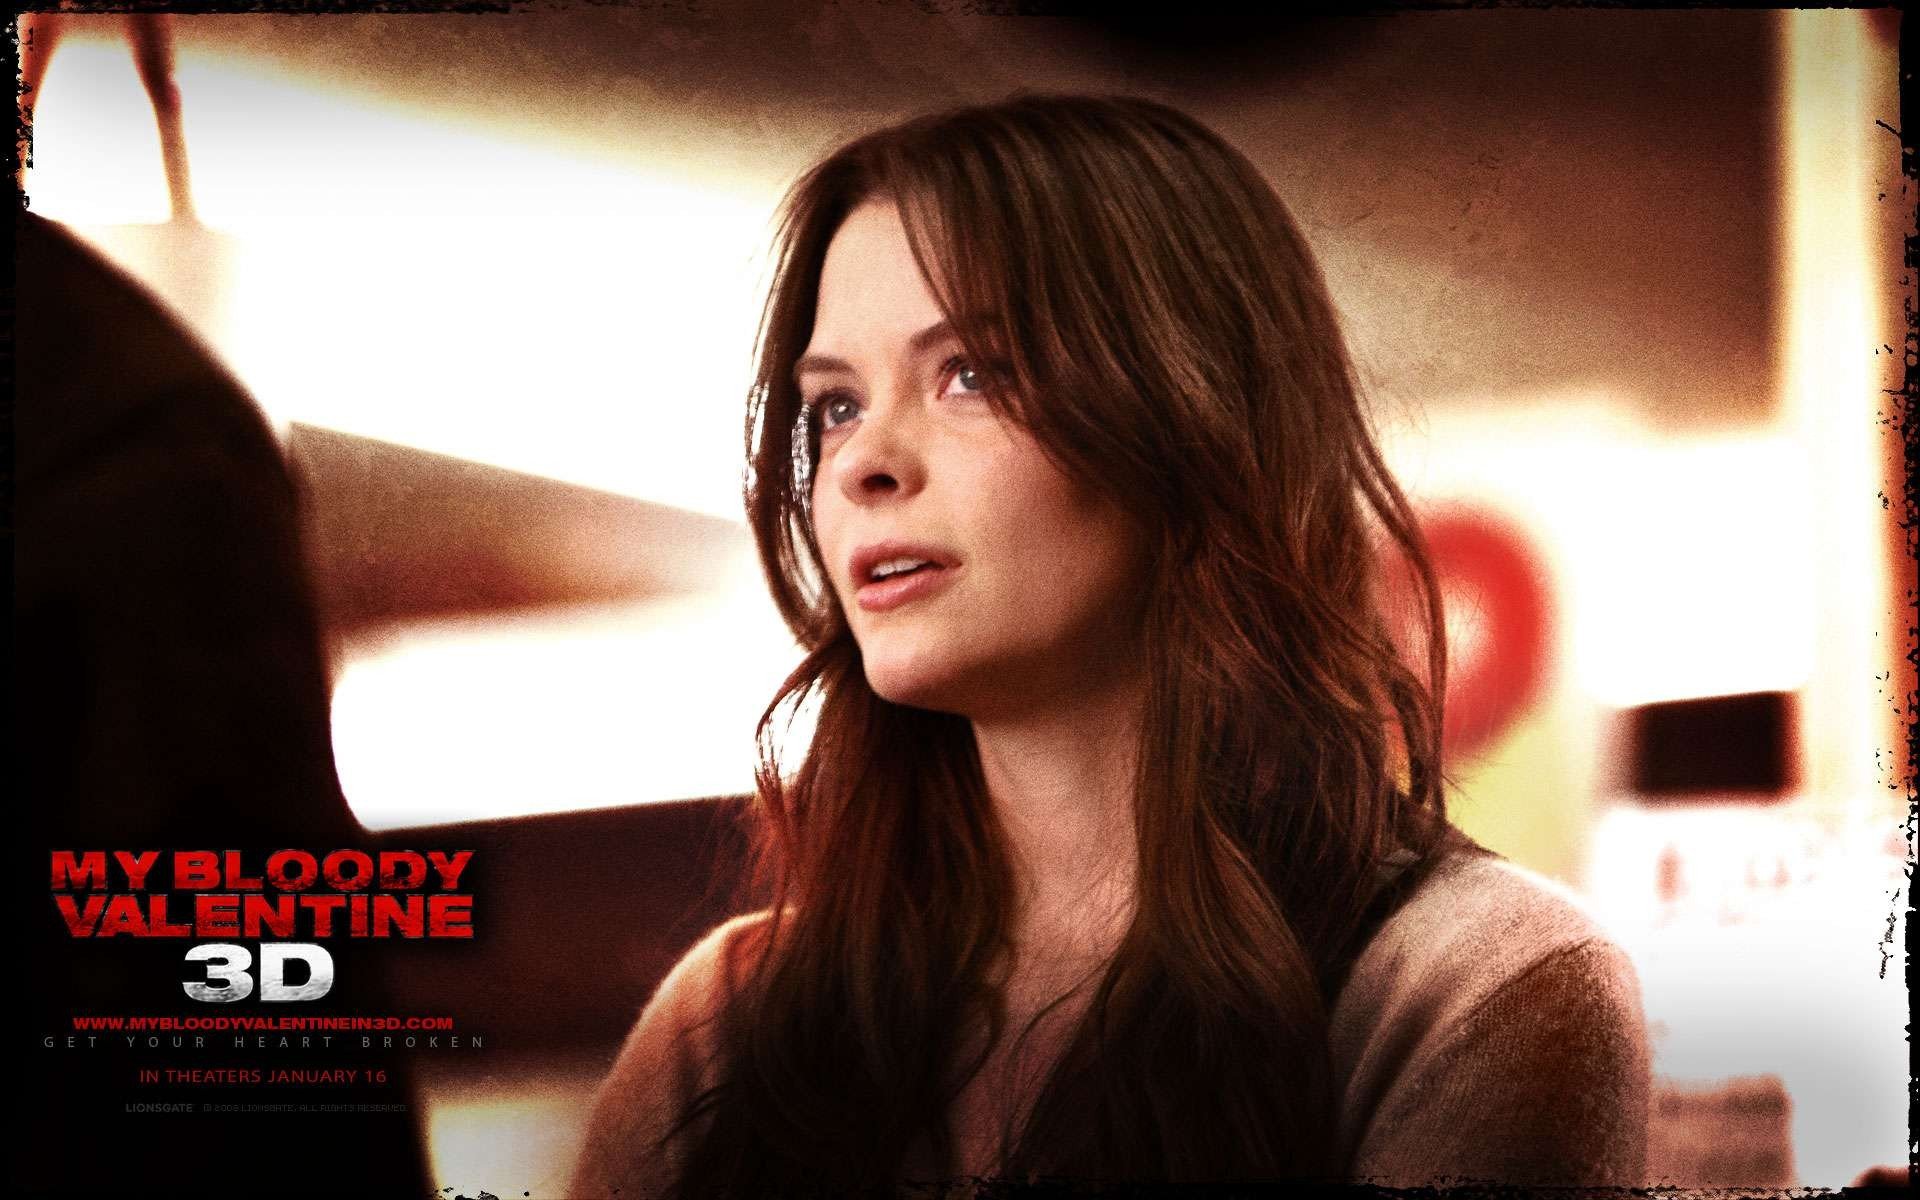 Un wallpaper del film My Bloody Valentine 3D con Jaime King